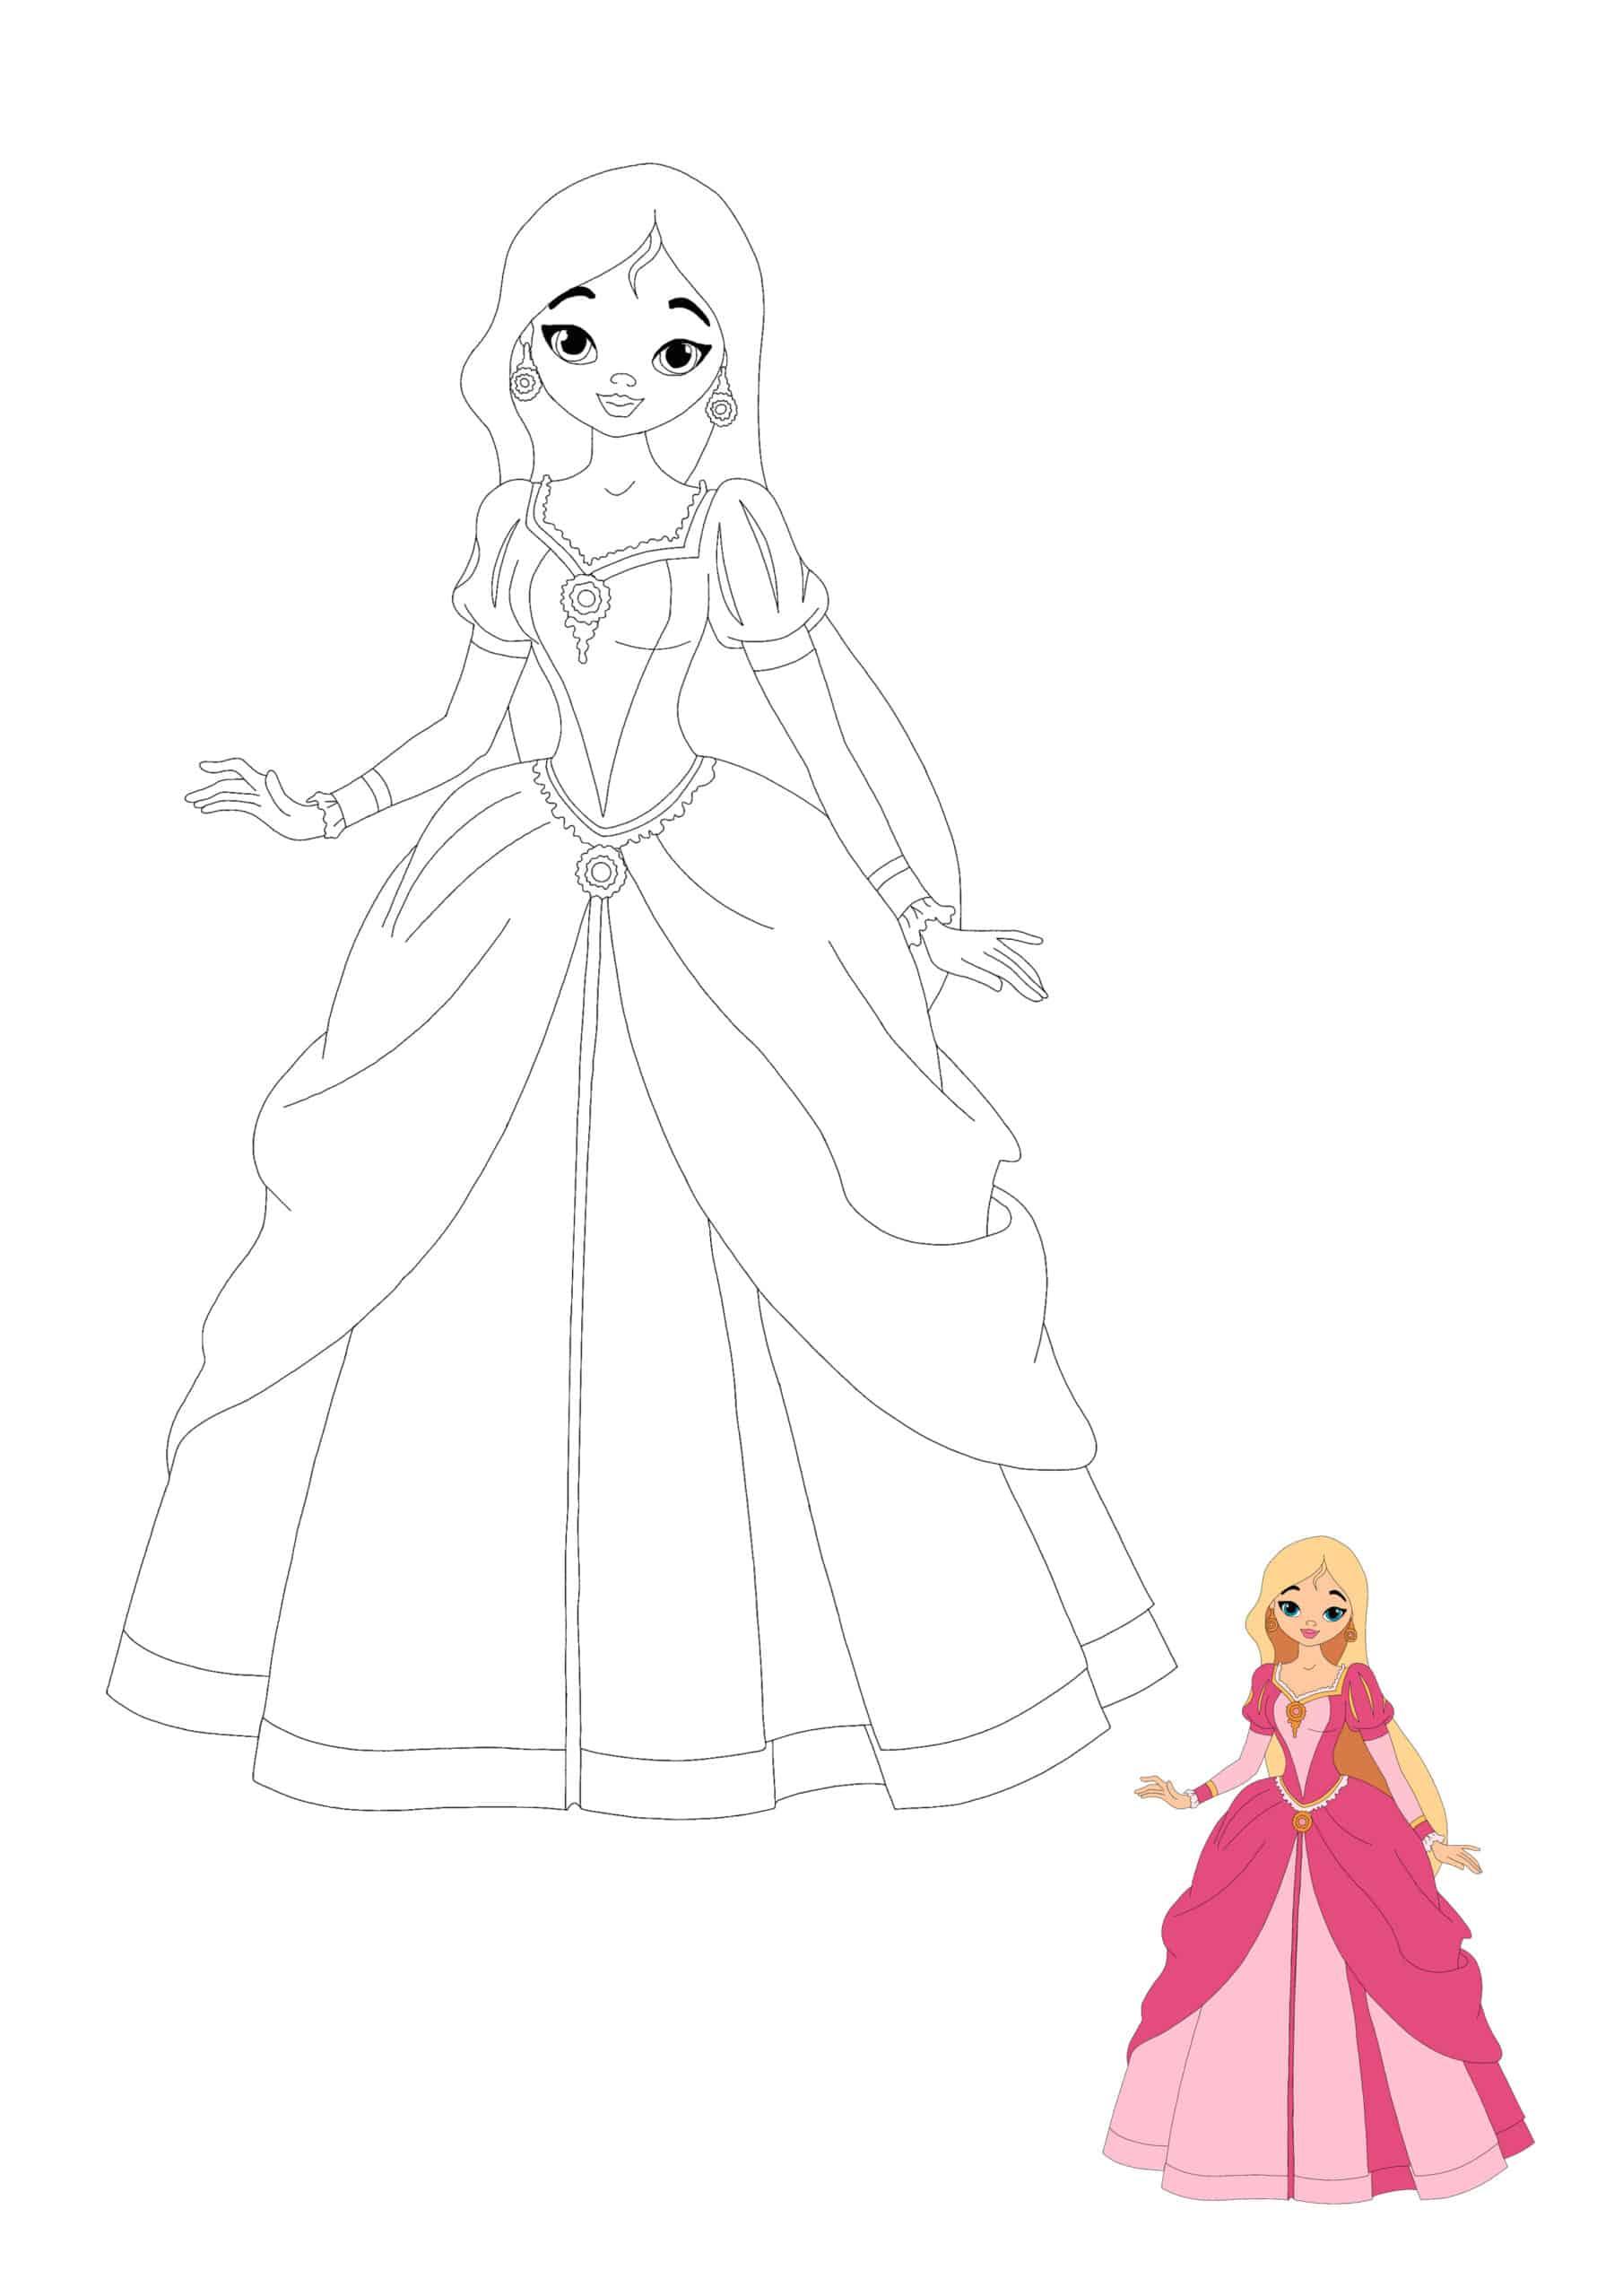 Cute Barbie Princess coloring page